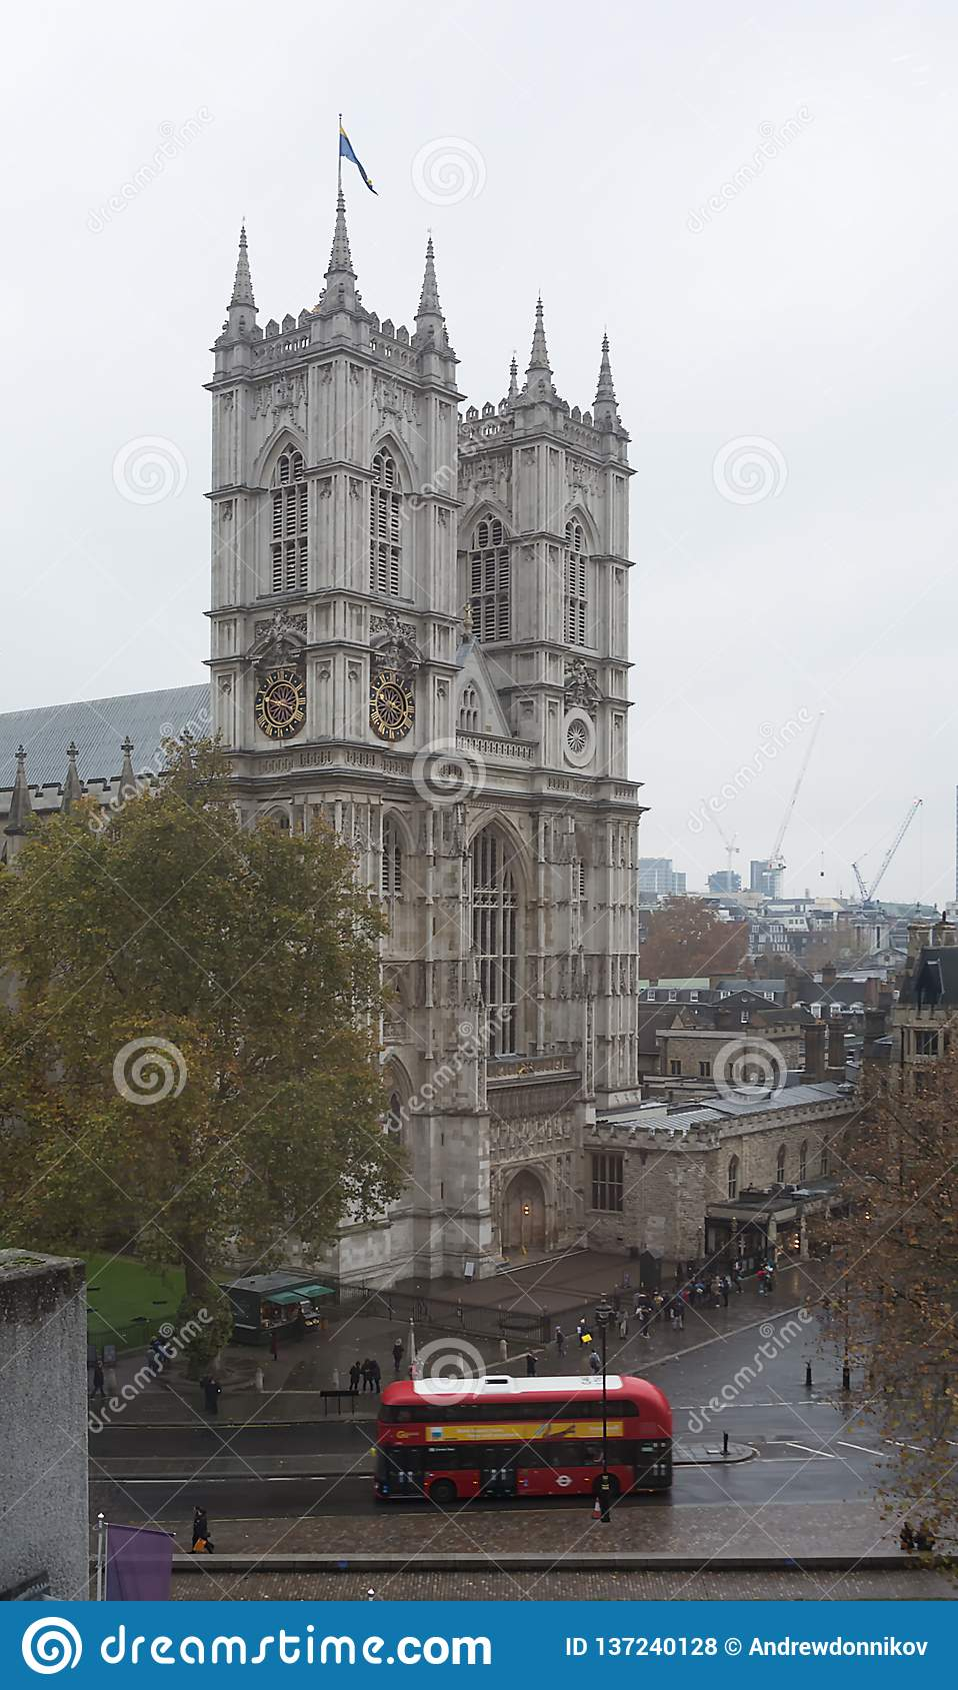 LONDON, VEREINIGTES KÖNIGREICH - 24. NOVEMBER 2018: Traditioneller roter Bus Londons, der nahe Westminster Abbey reist